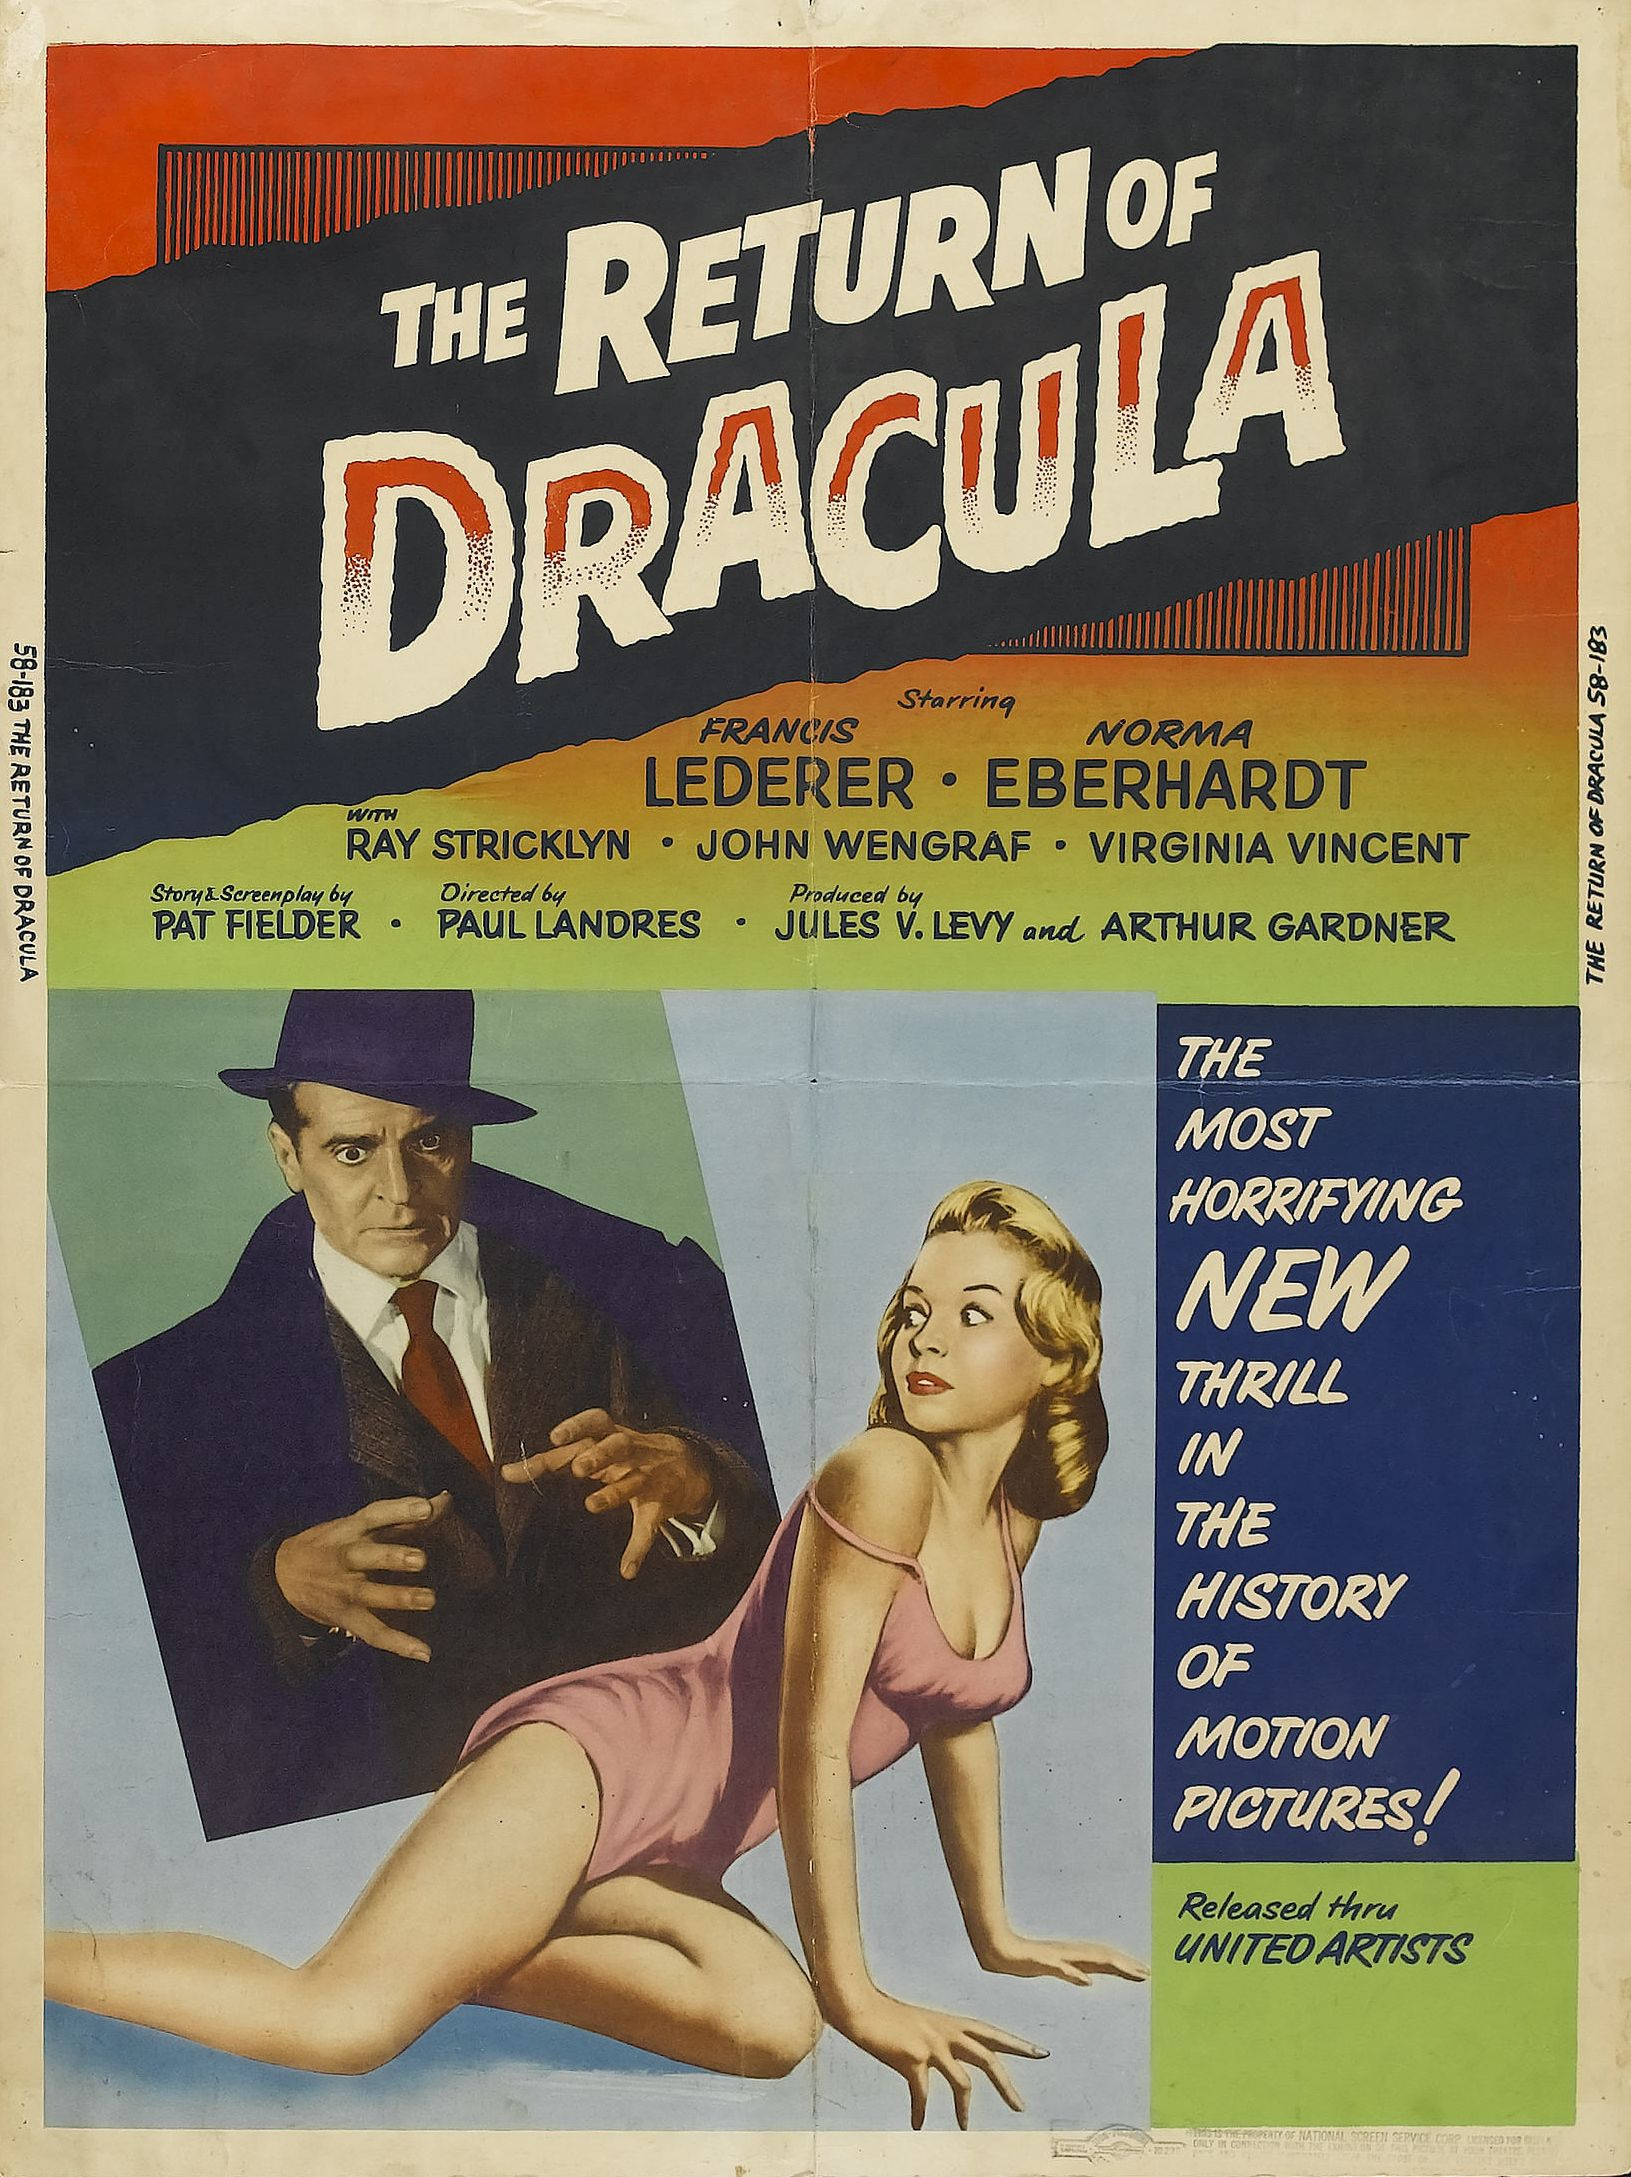 The Return of Dracula (1958) | savagehippie